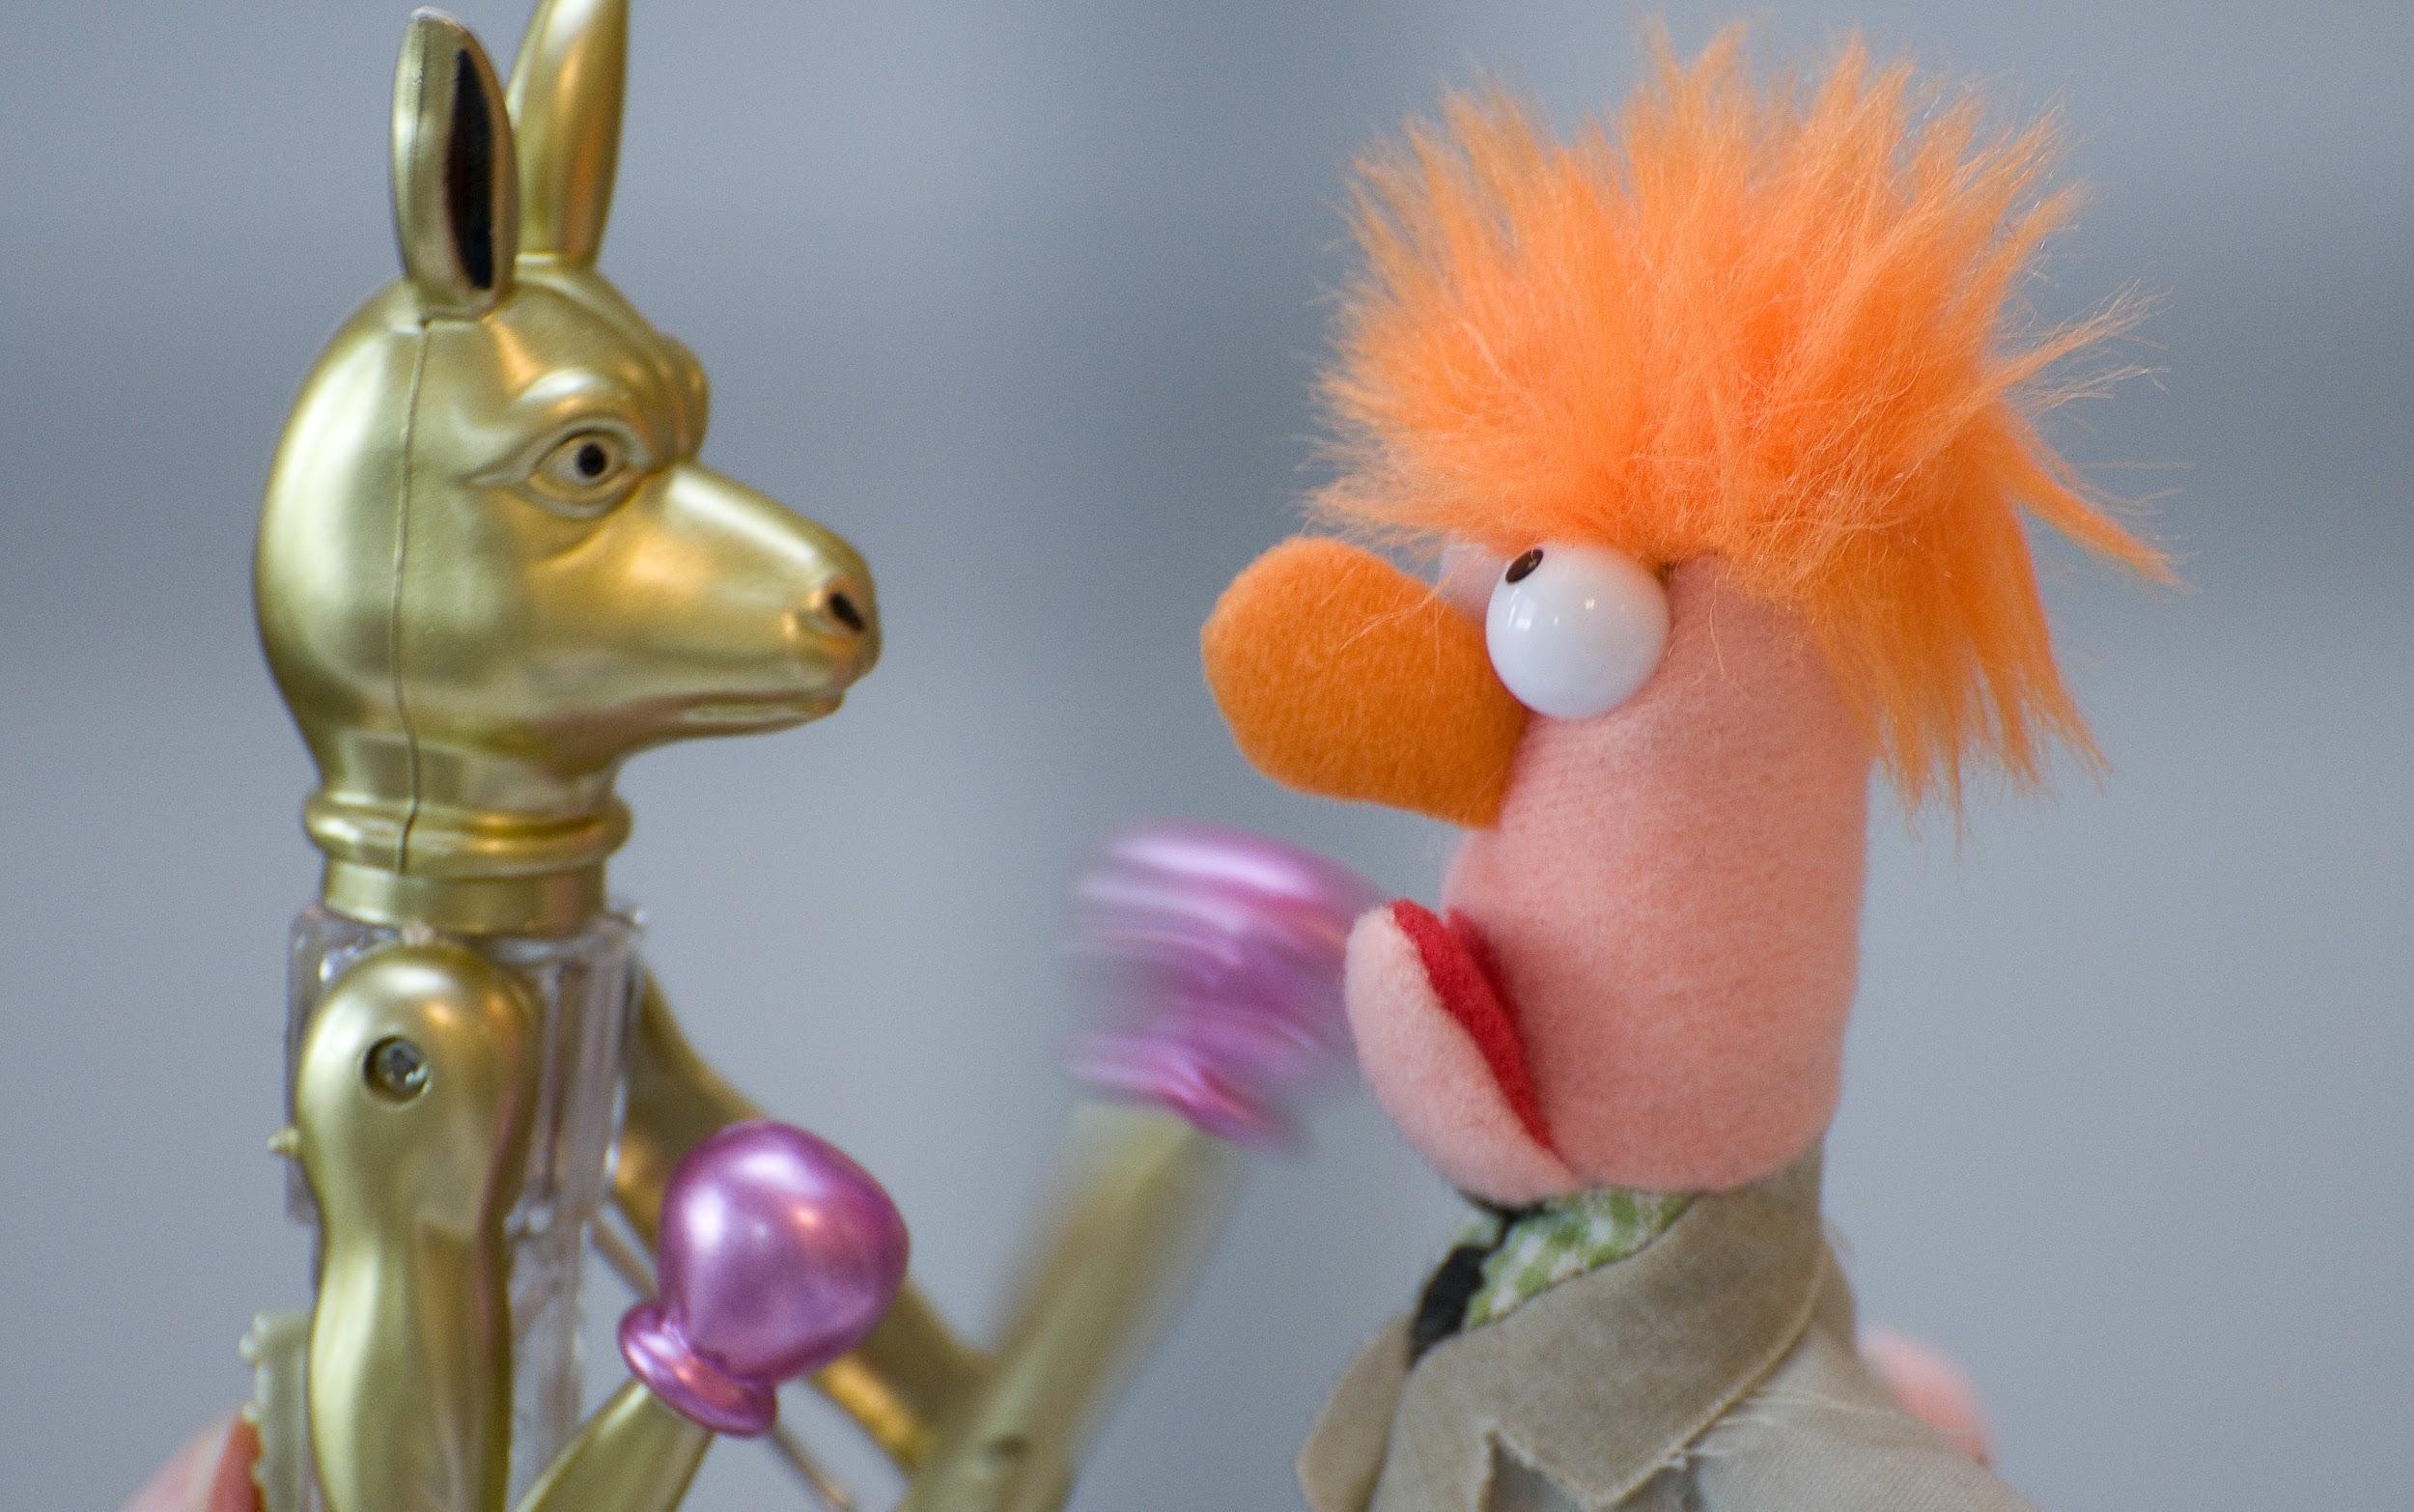 The Muppet Beaker boxes a golden metal kangaroo